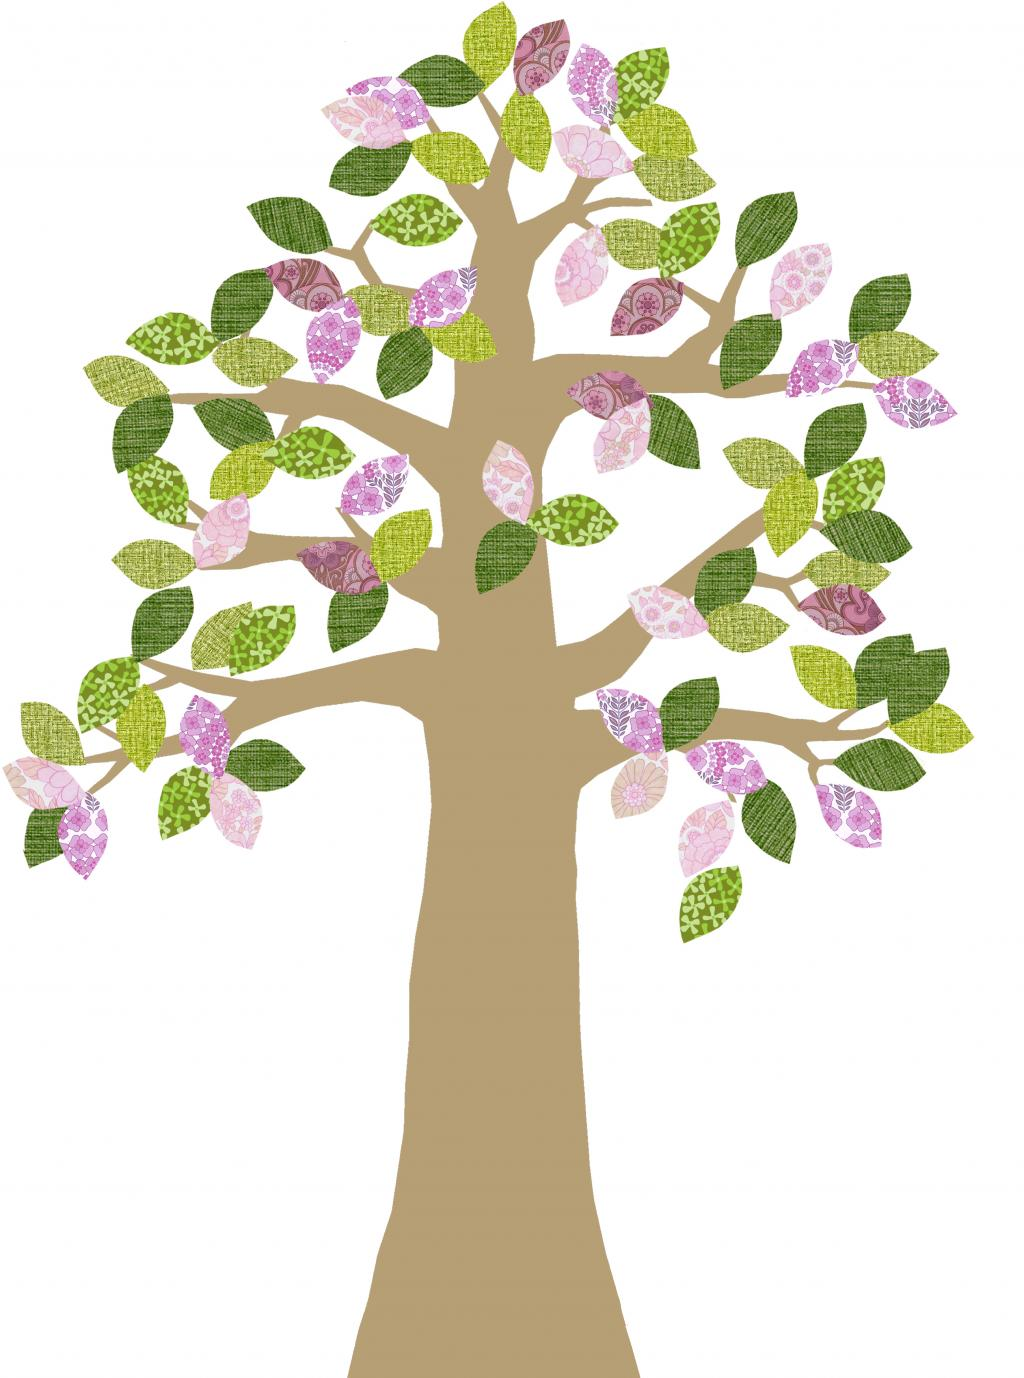 Wallpaper decal golden trunk. April clipart tree